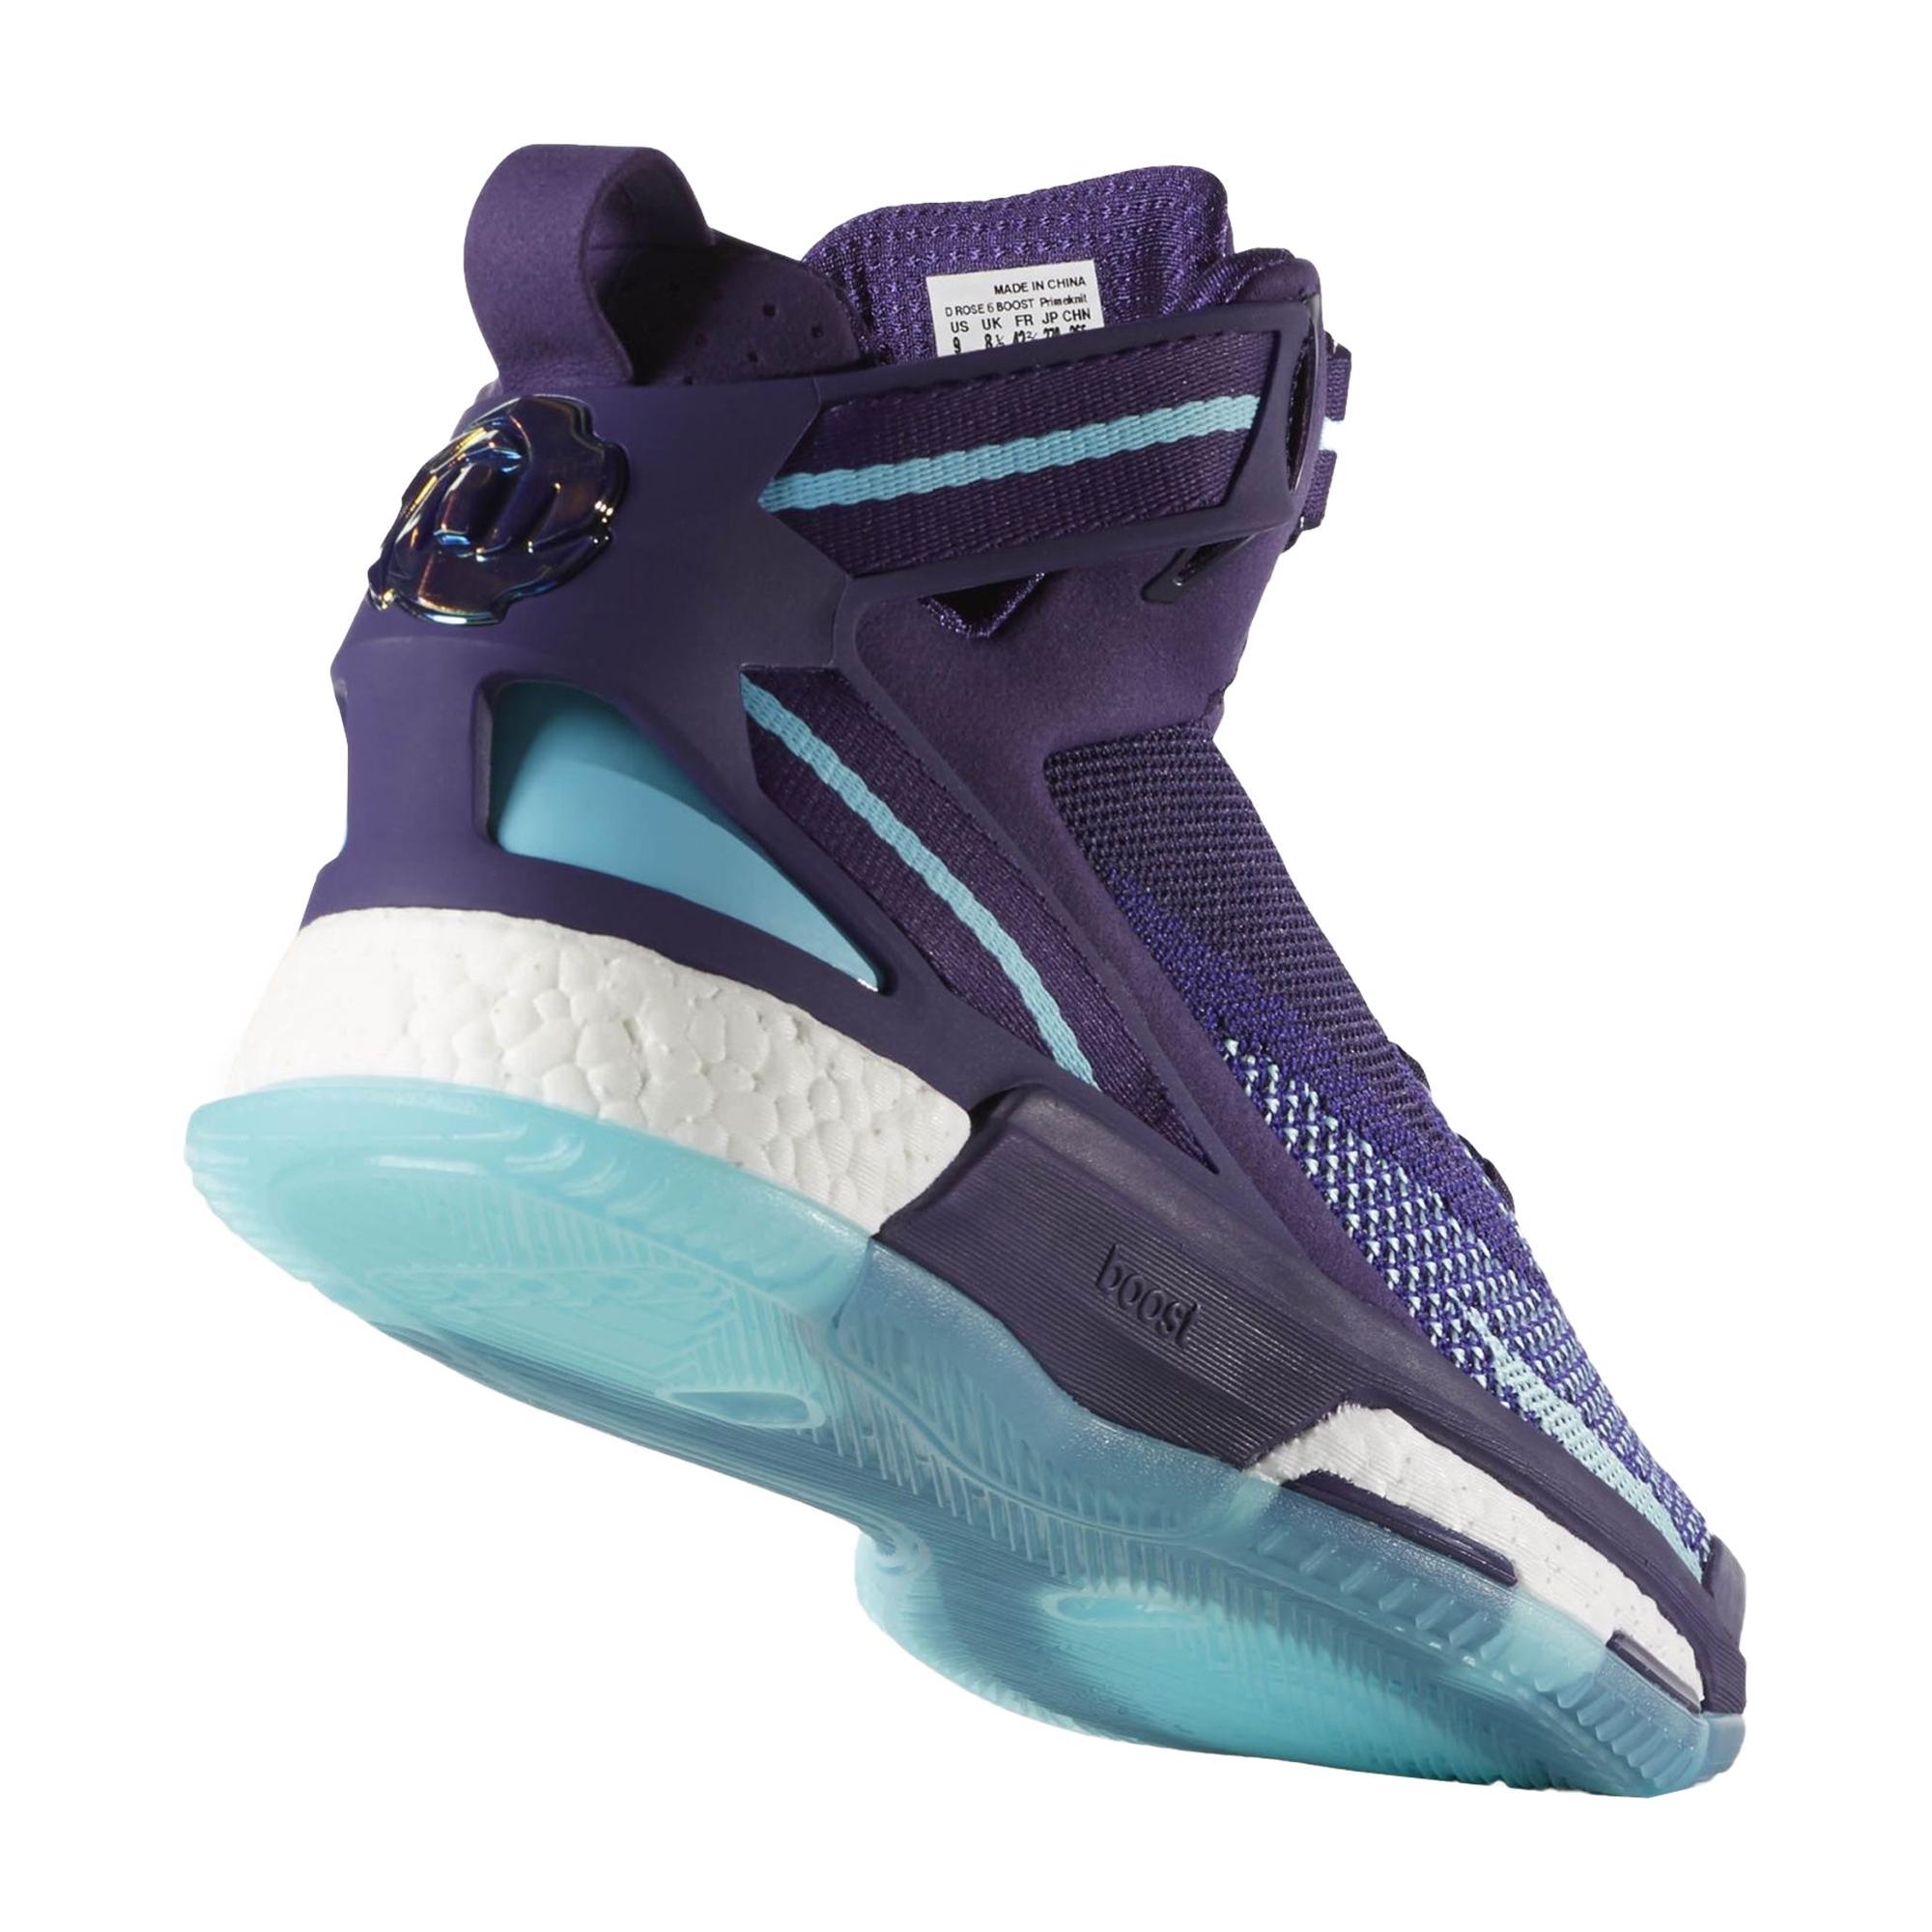 5ca56da98eae ... order adidas derrick rose 6 boost primeknit erkek basketbol ayakkabs  3cec6 a7f0f ...